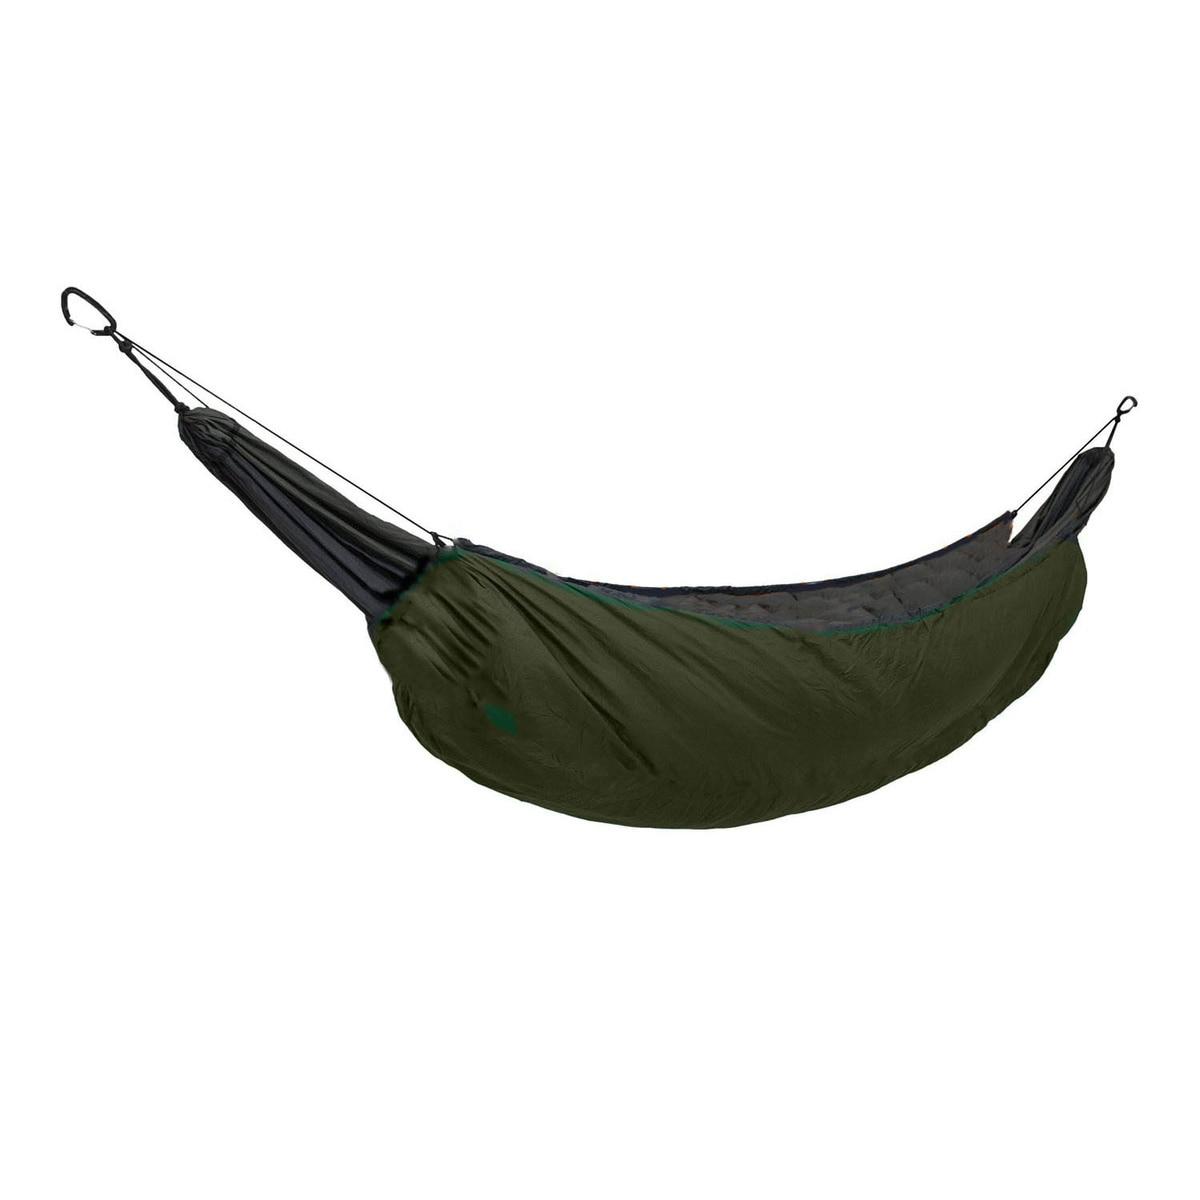 Lightweight Full Length Hammock Underquilt Under Blanket Ultralight Camping Insulation Sleeping Bag 40 F to 68 F (5 C to 20 C)